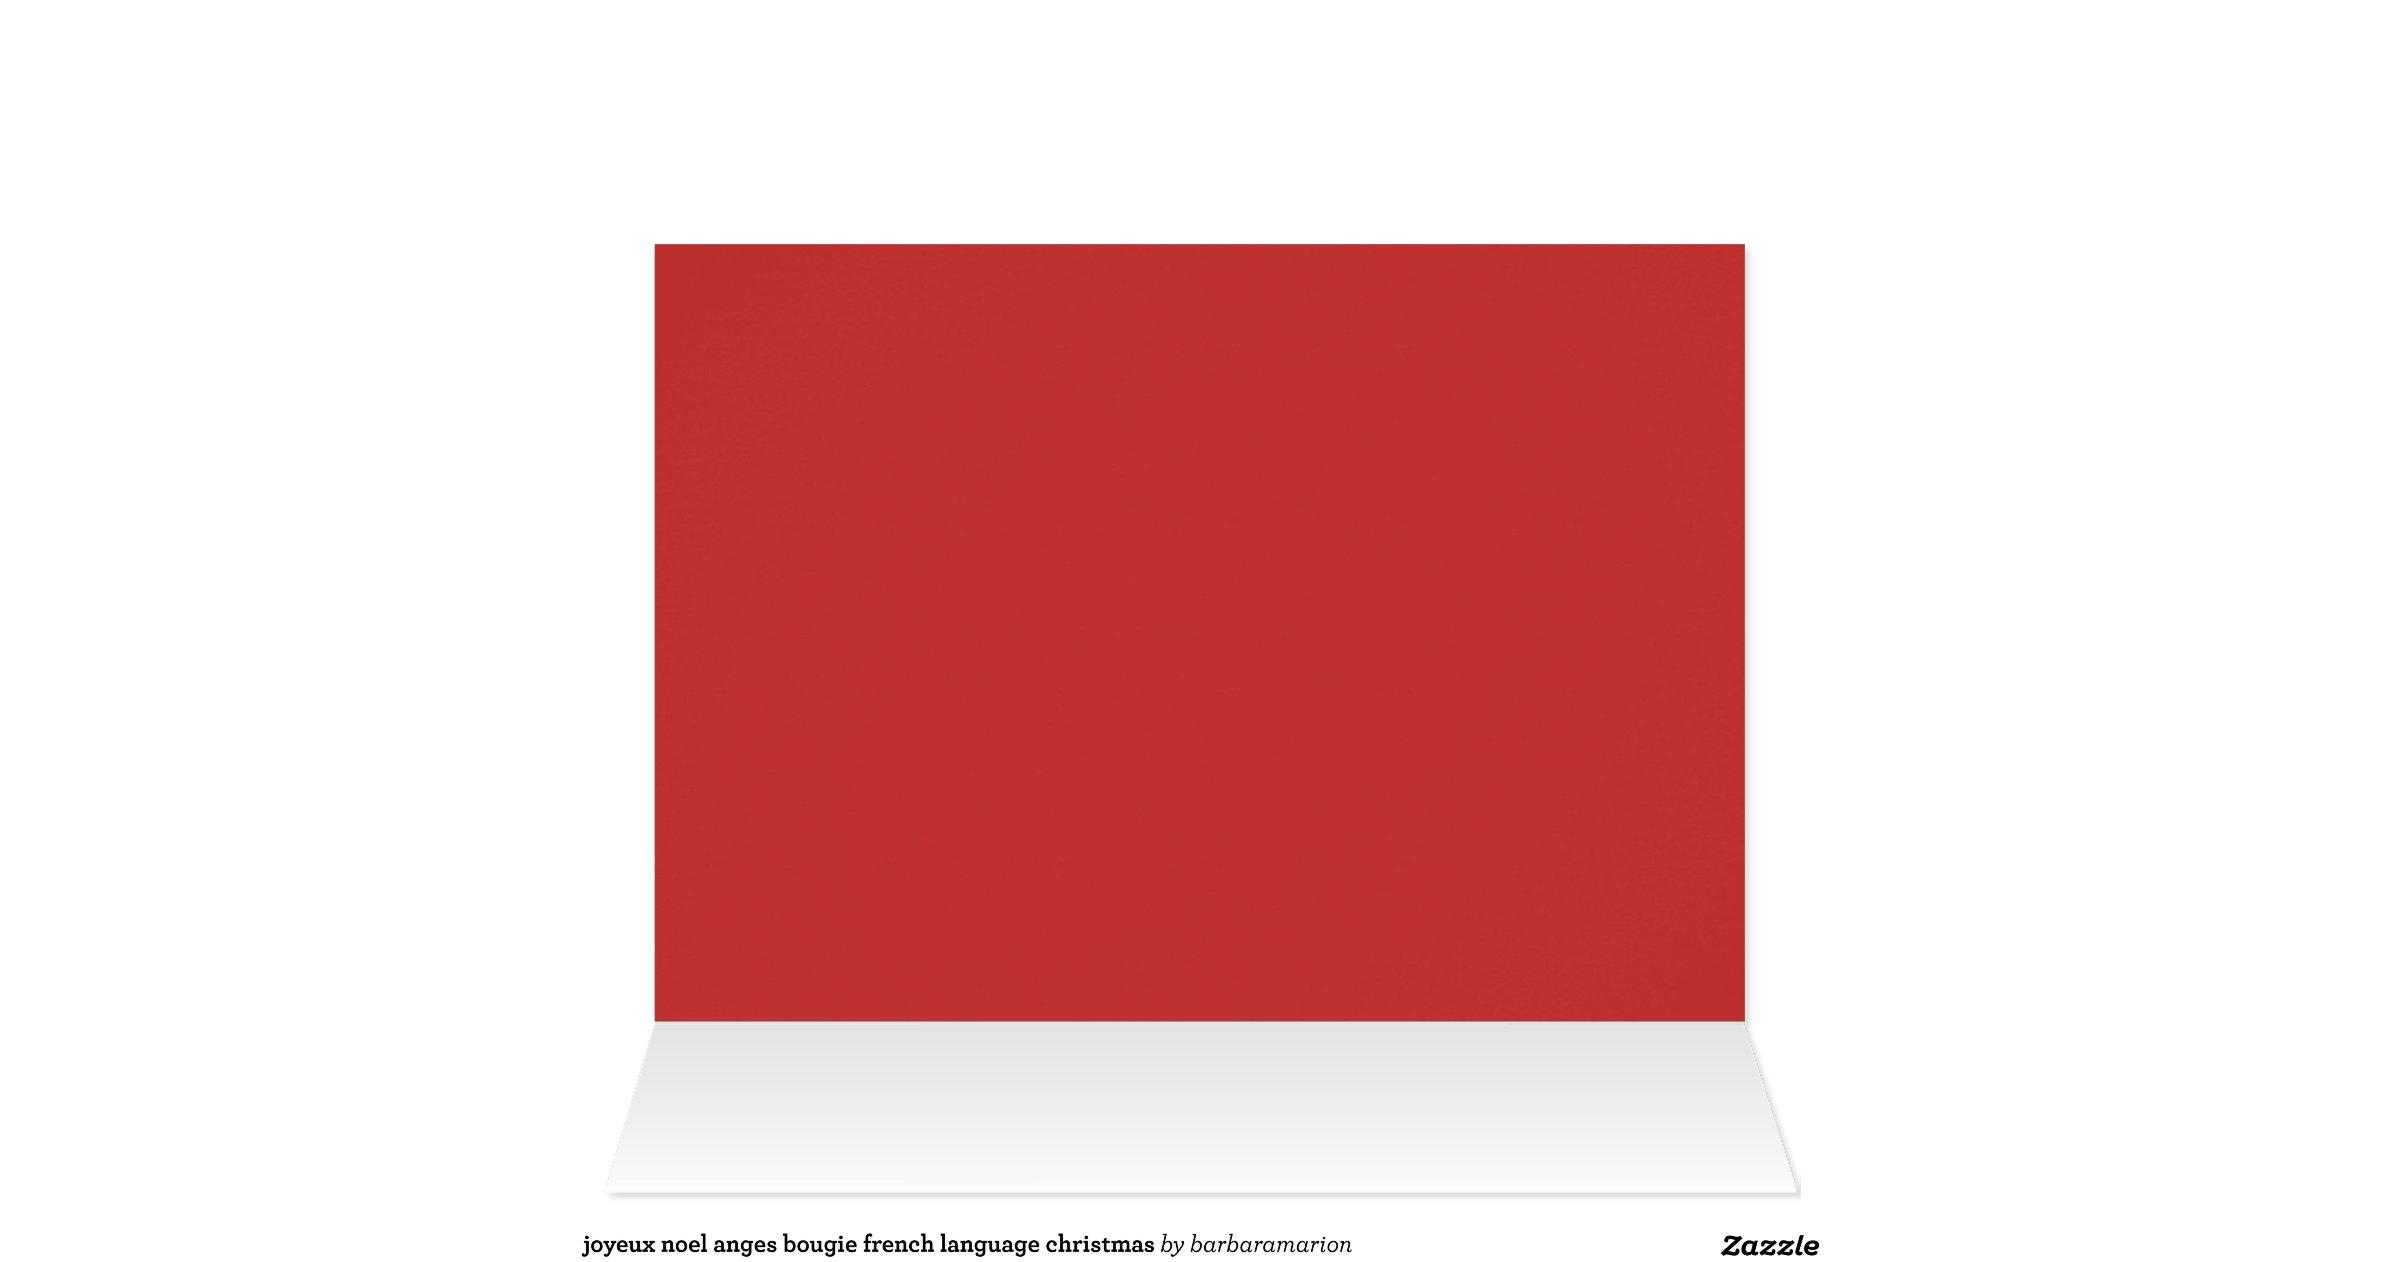 joyeux noel anges bougie french language christmas greeting card zazzle. Black Bedroom Furniture Sets. Home Design Ideas